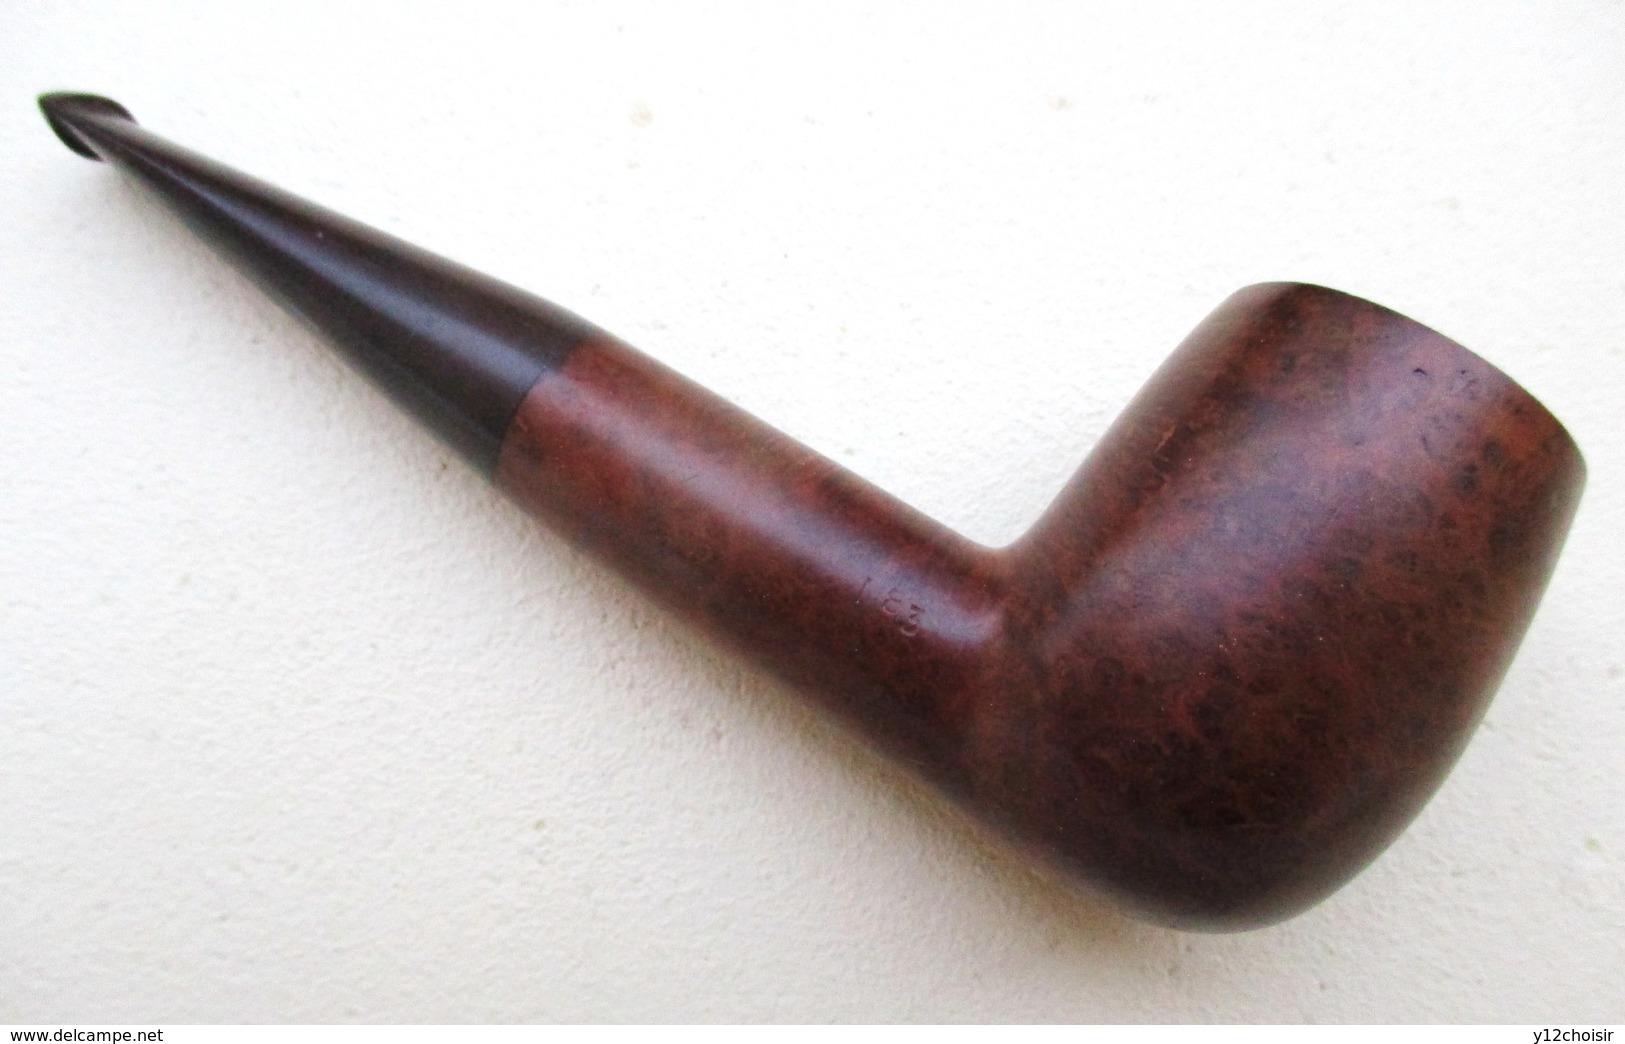 COMME NEUVE PIPE ROPP SIX OBJET DU FUMEUR SANS TABAC - Heather Pipes